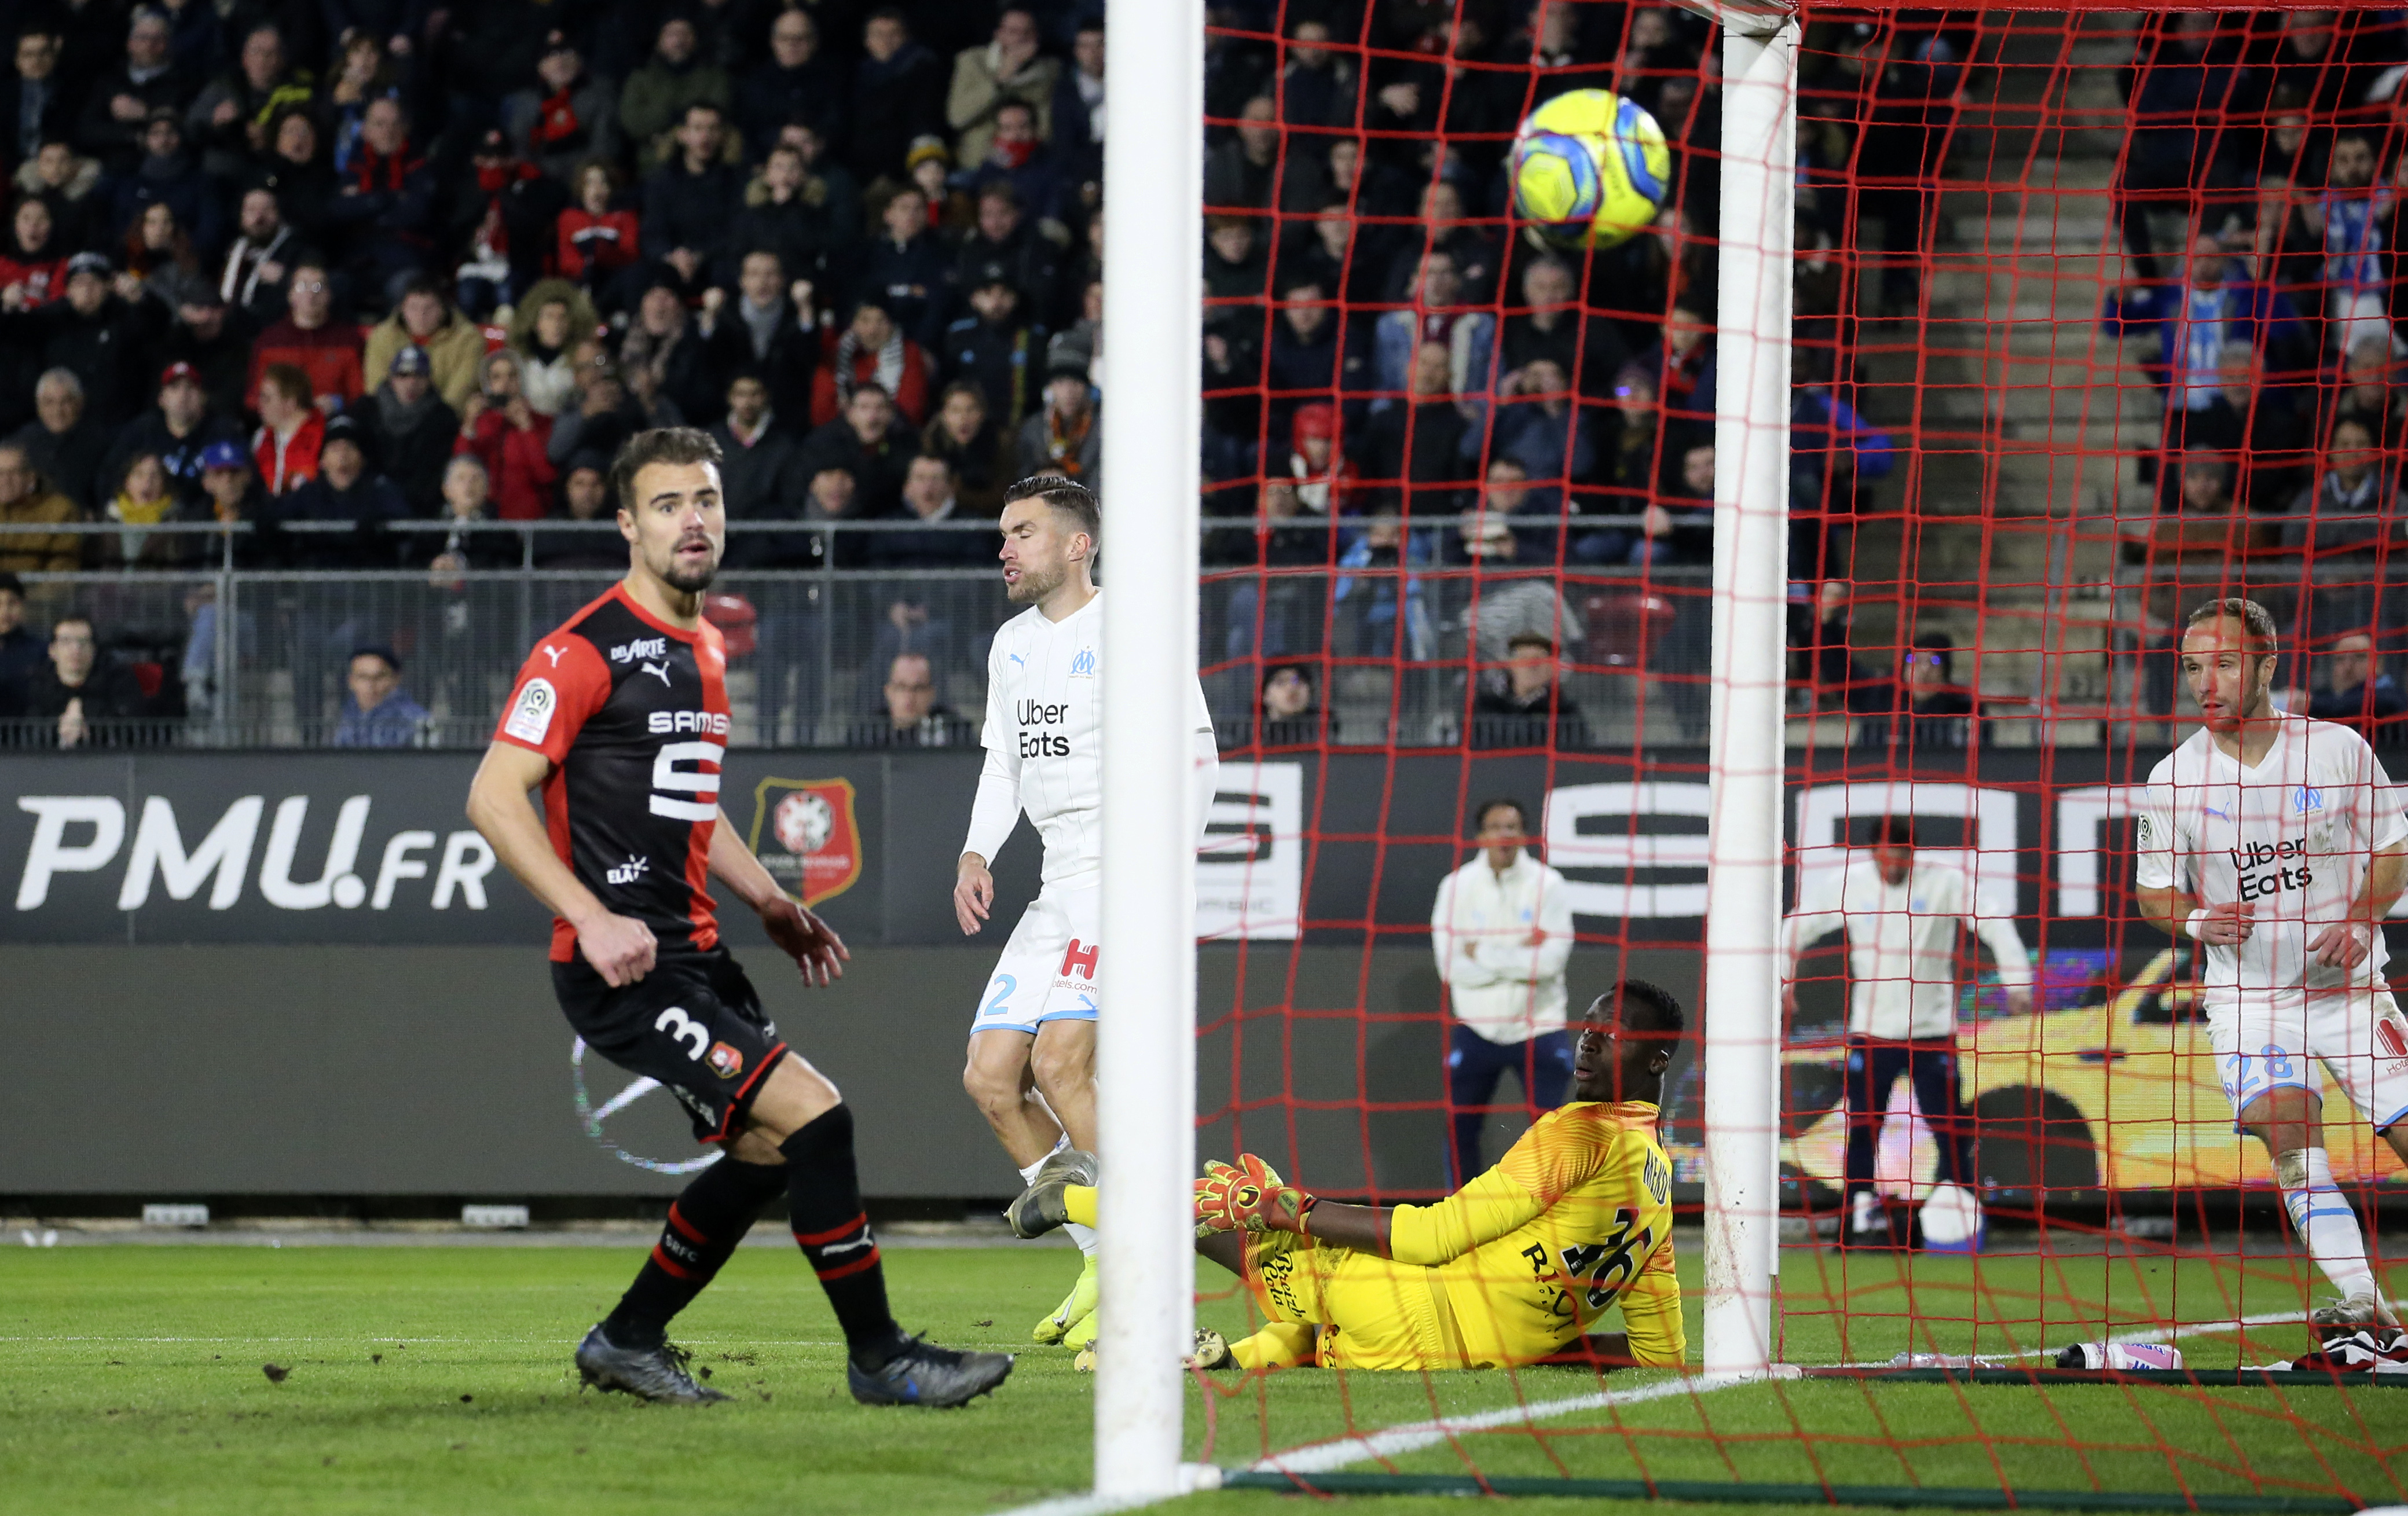 Strootman scores late winner as Marseille wins 1-0 at Rennes